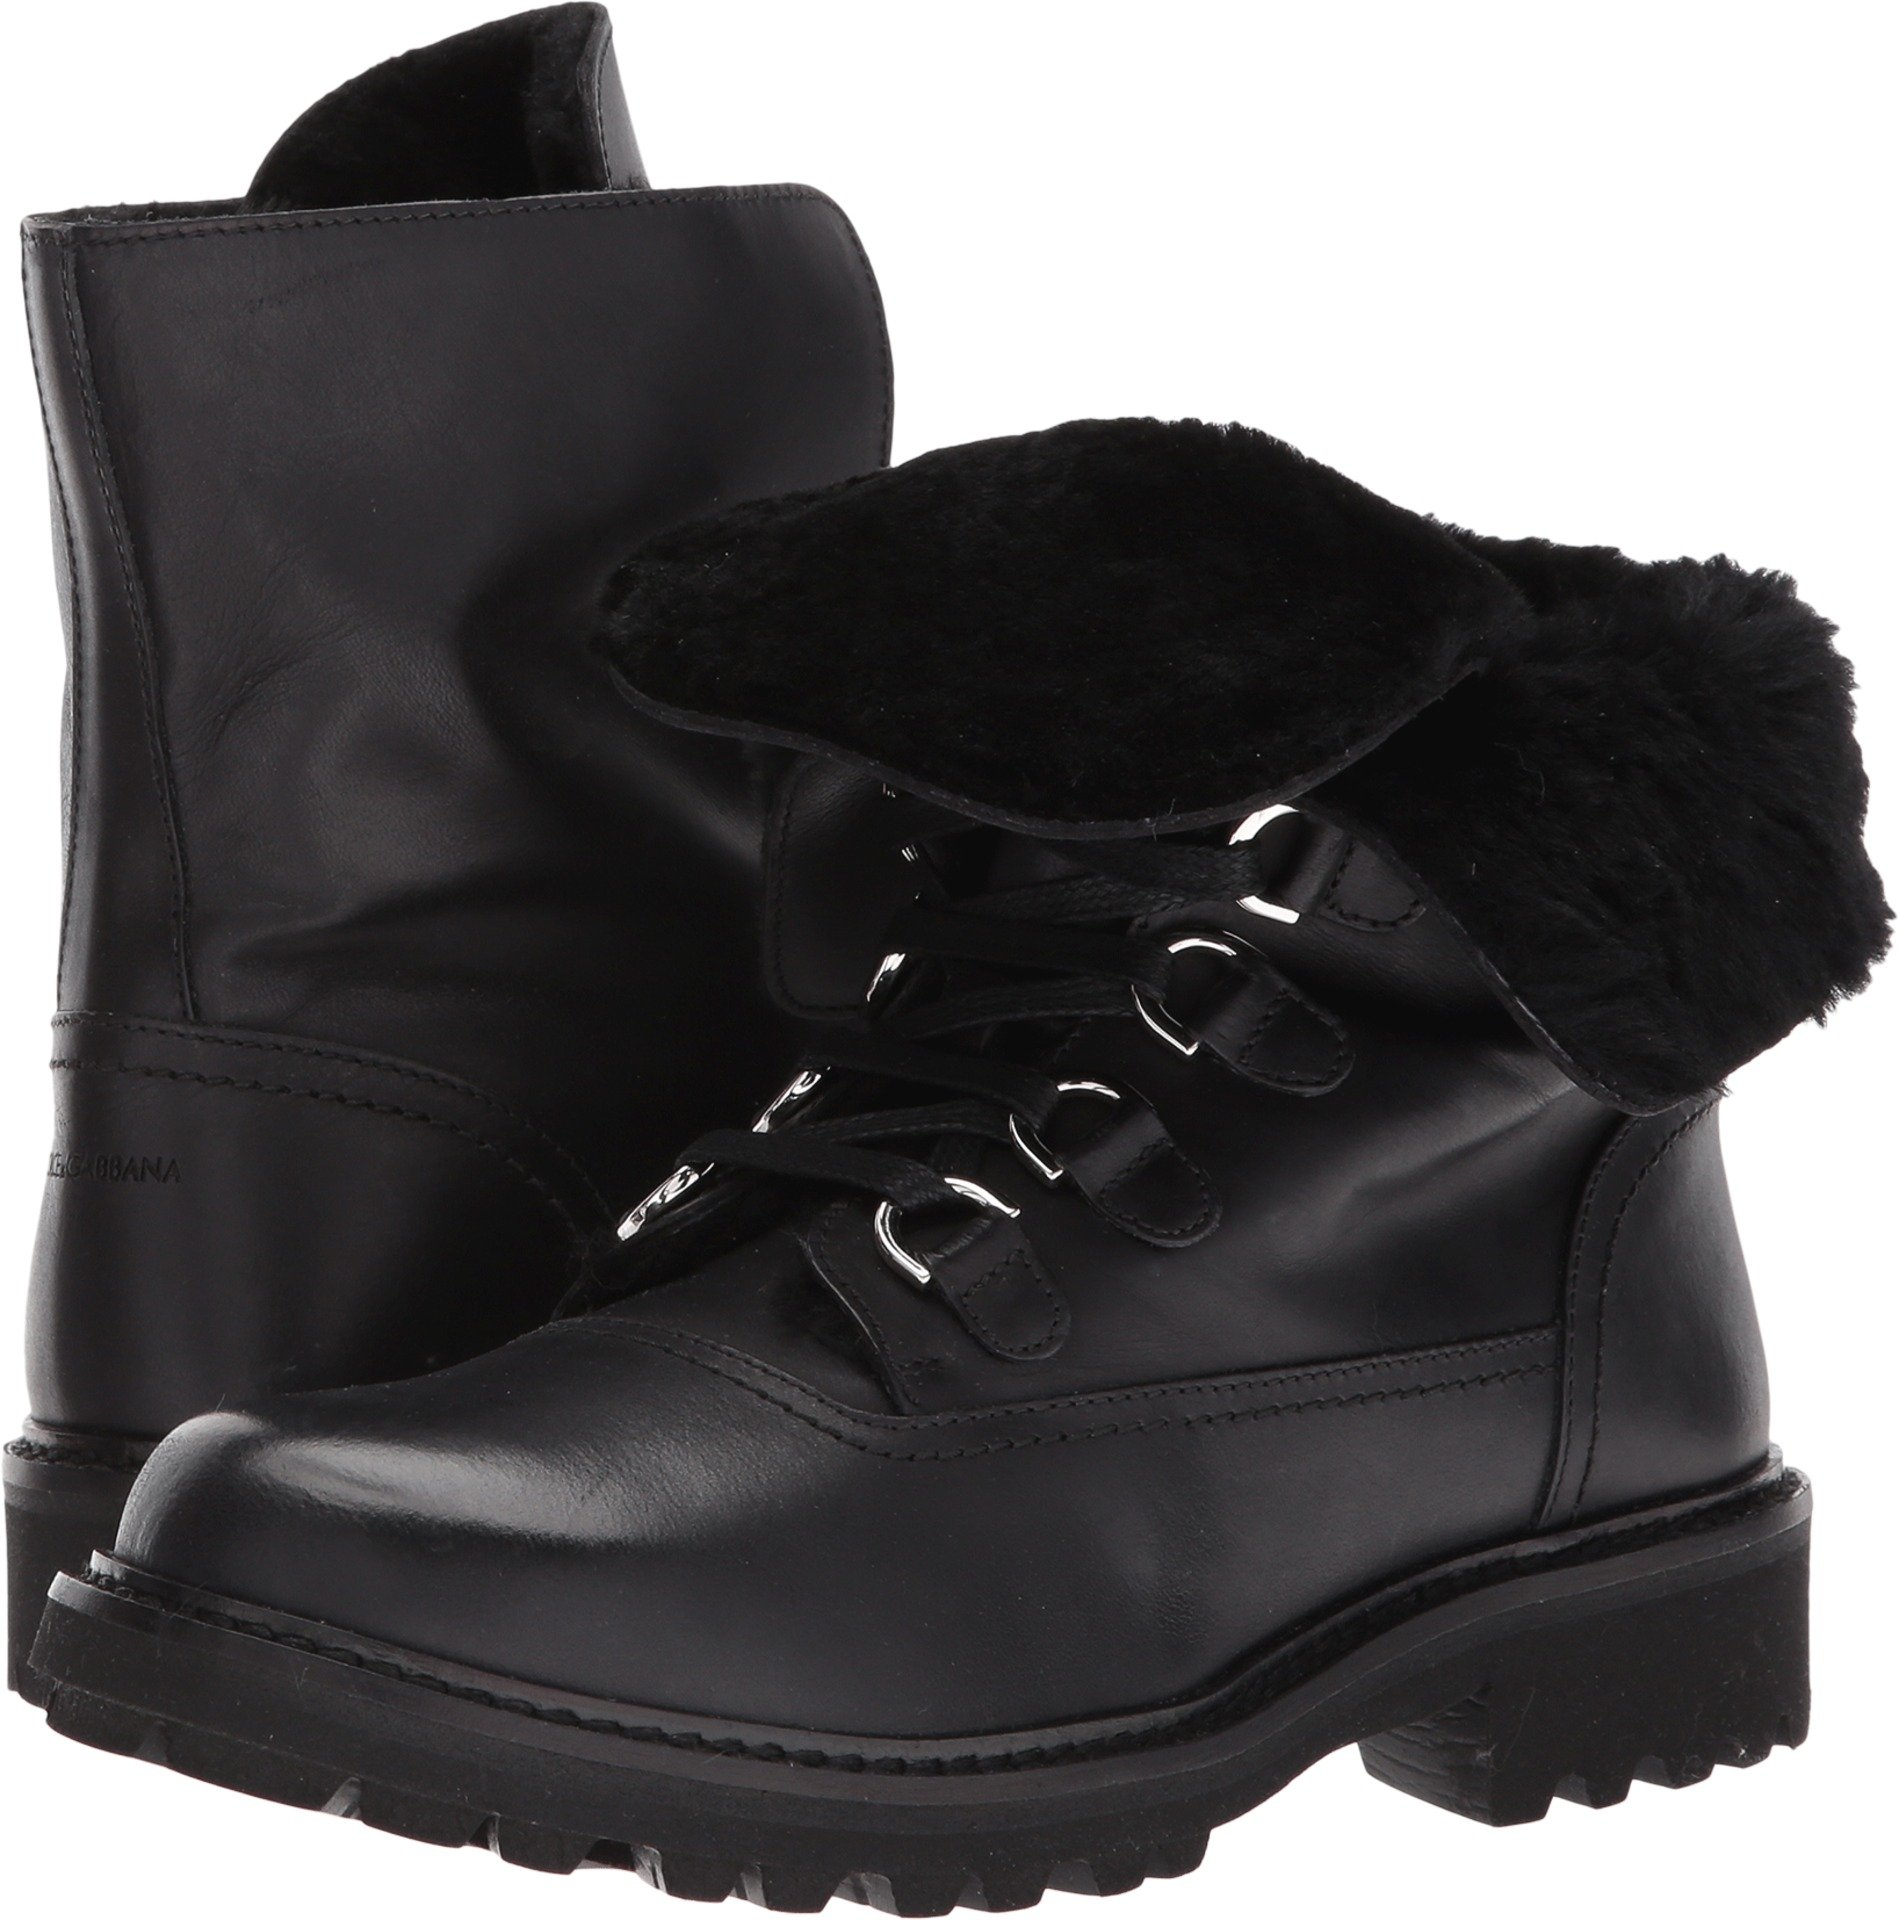 Dolce & Gabbana Kids  Boy's Lace-Up Boot (Little Kid/Big Kid) Black 33 M EU